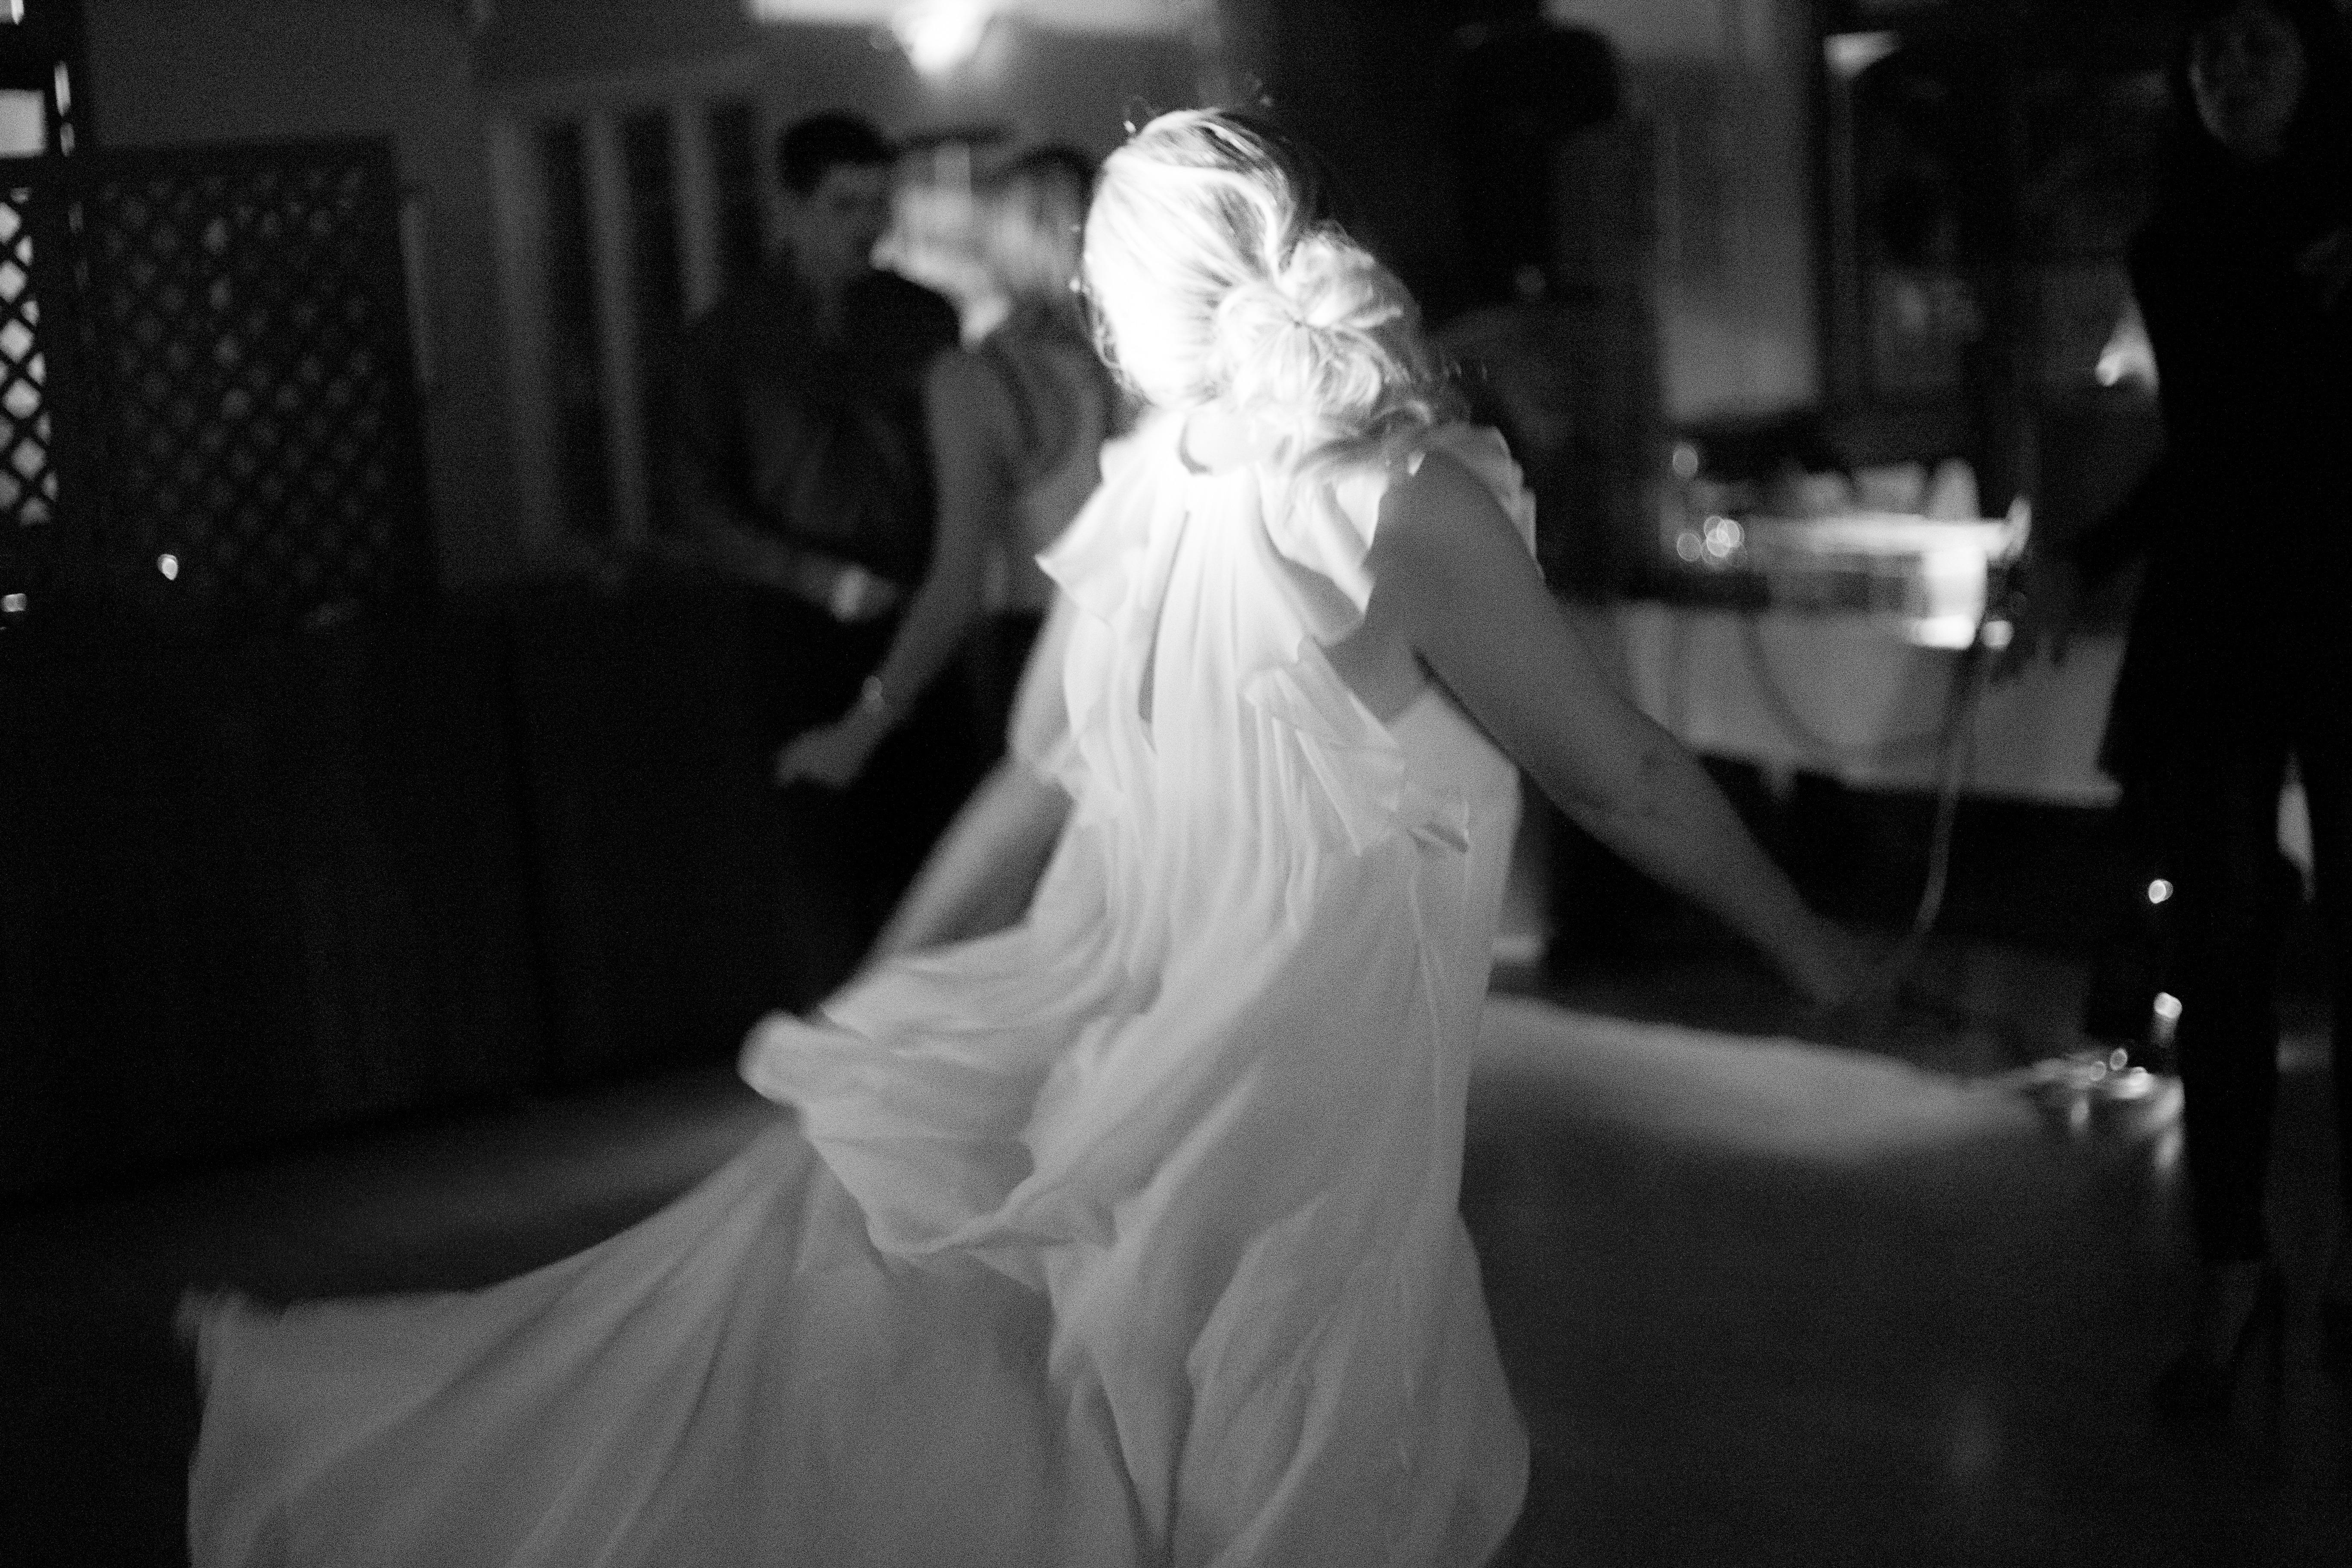 Man Person Black And White Woman Photography Dance Monochrome Movement Lighting Wedding Dress Bride